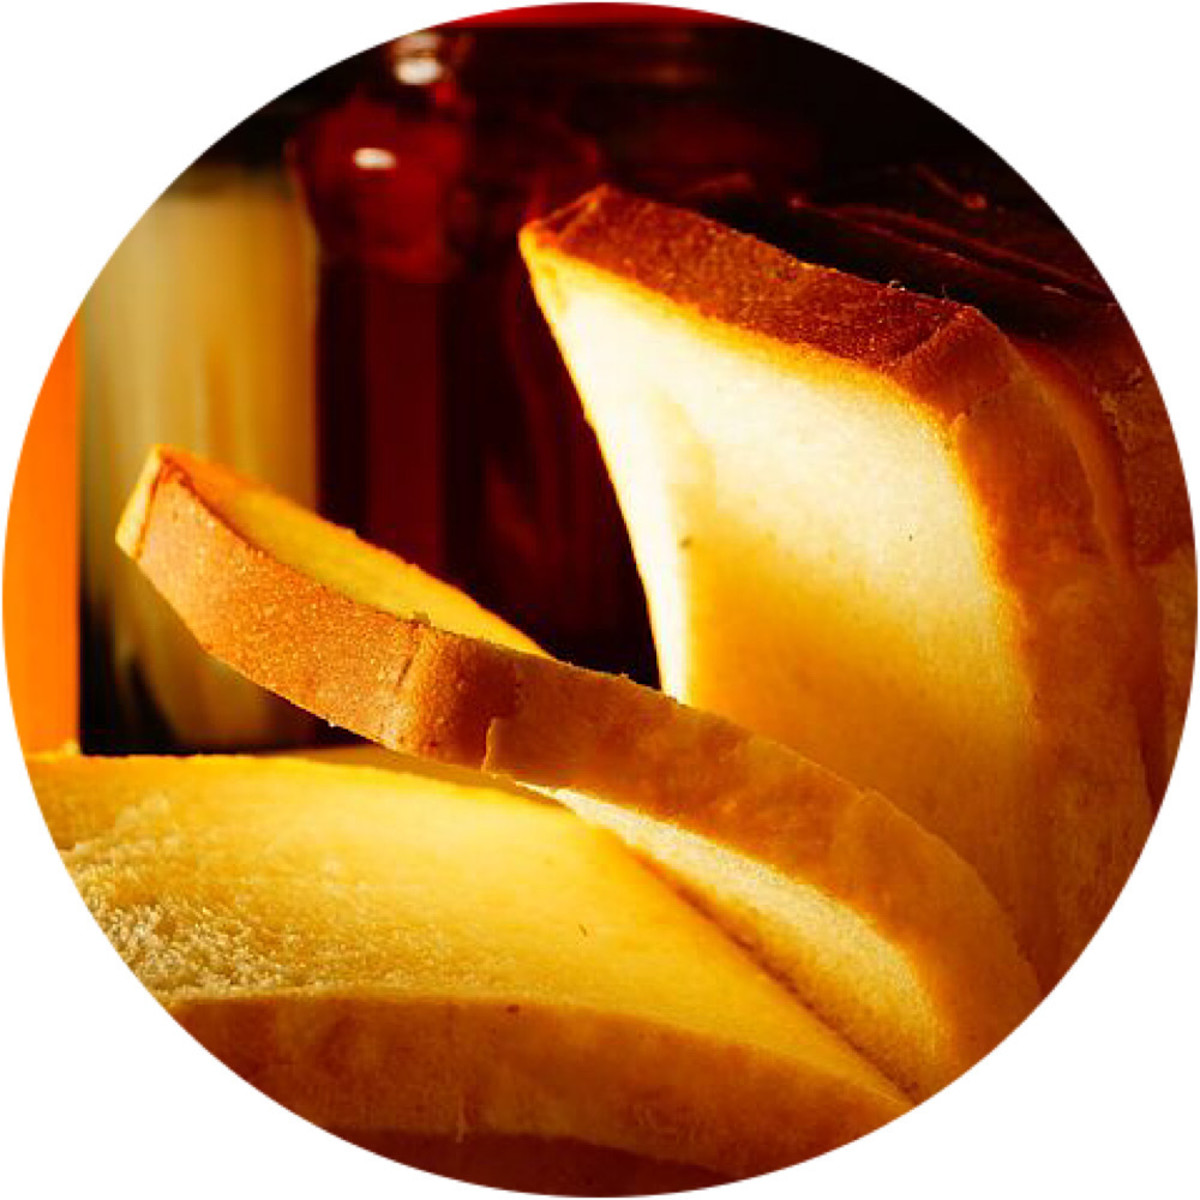 Necessity of Bread